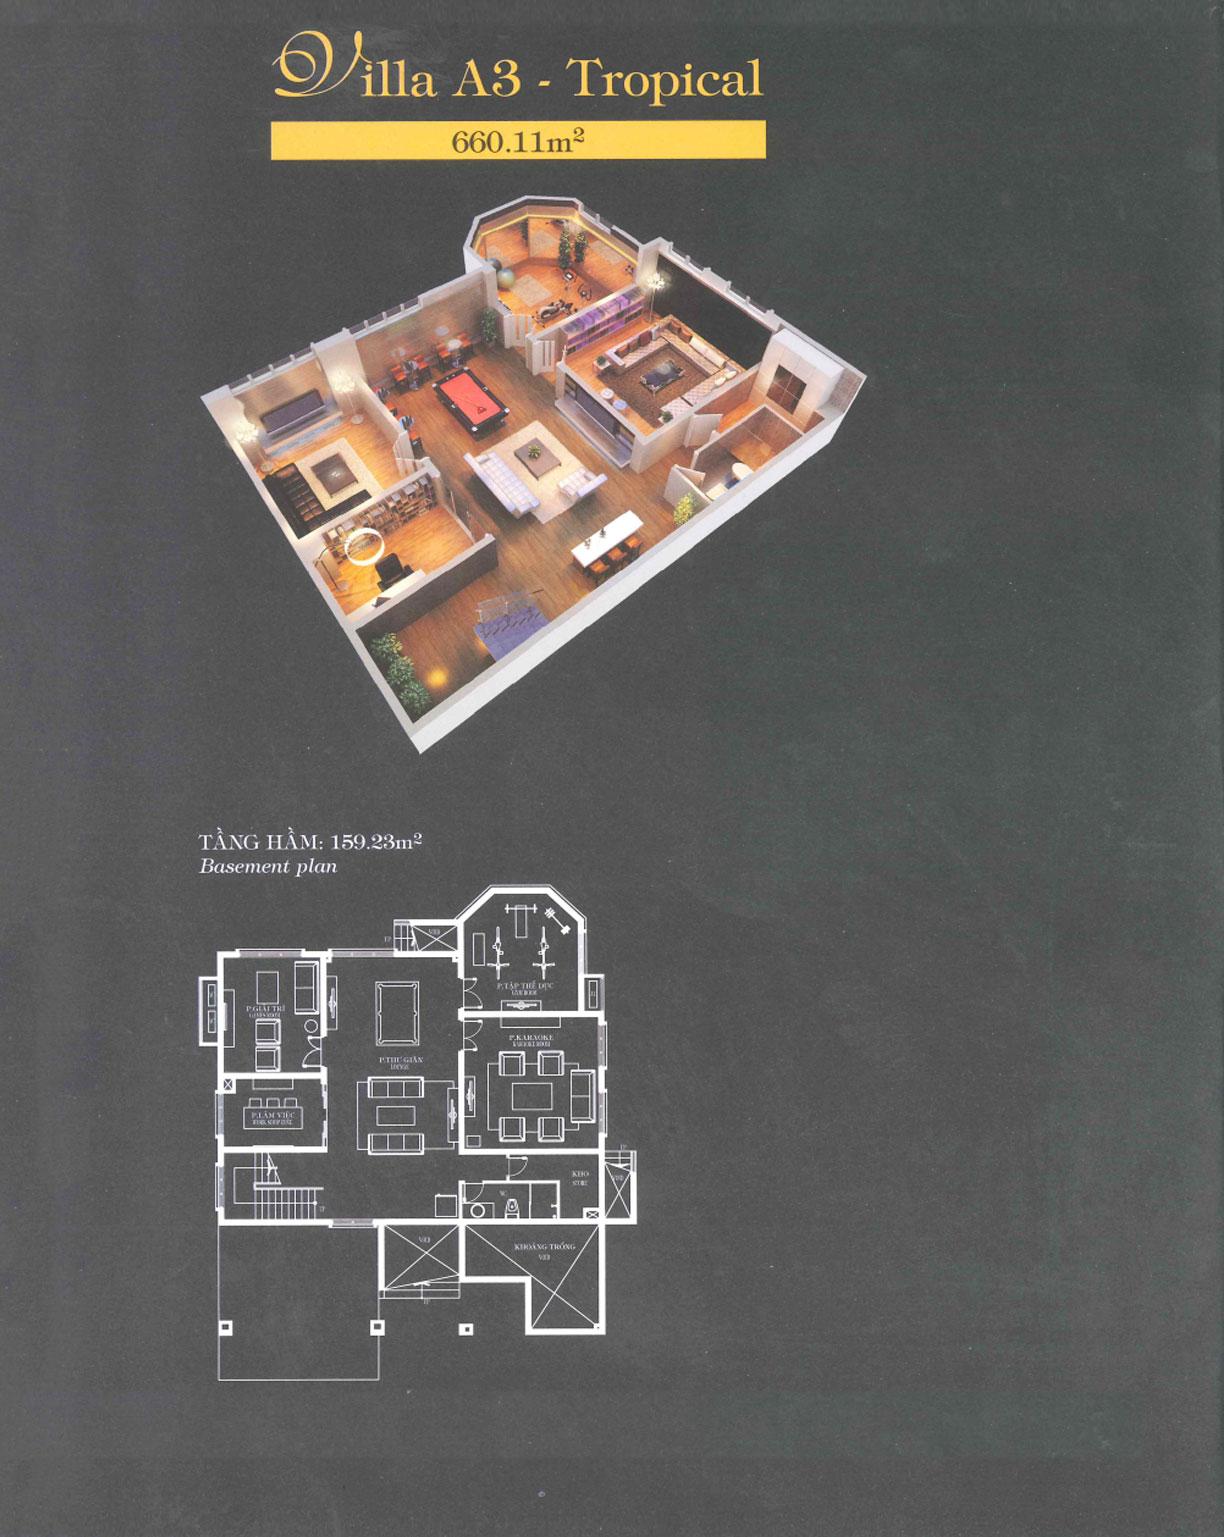 Villa A3 - Tropical -Tầng hầm